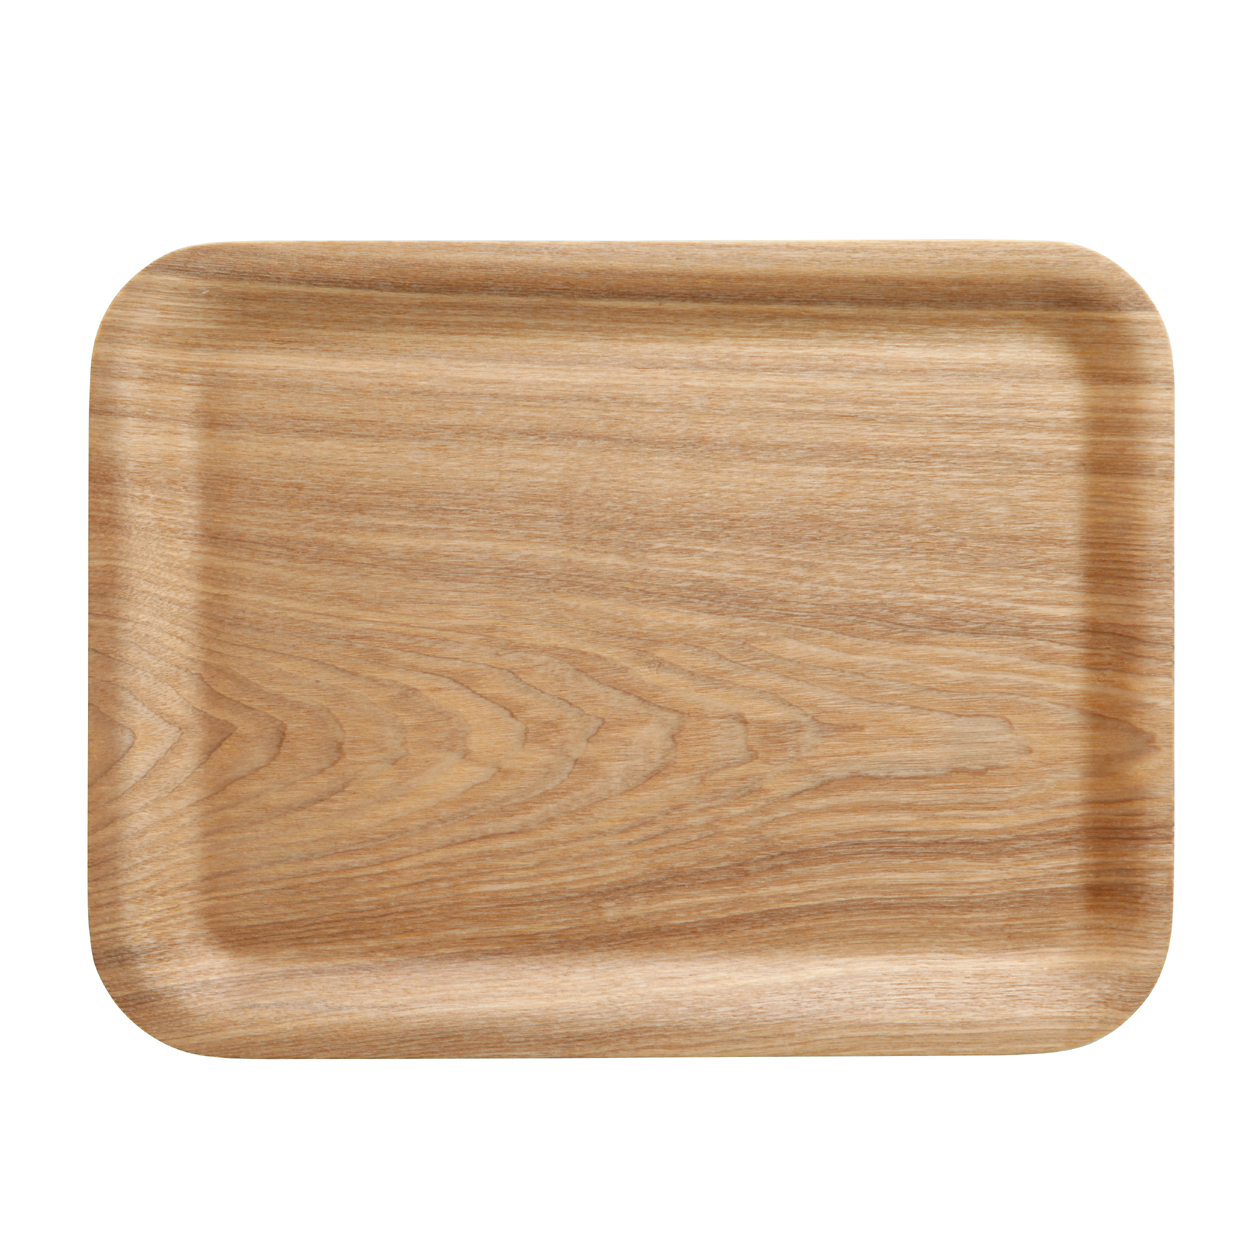 RoomClip商品情報 - 木製トレータモ